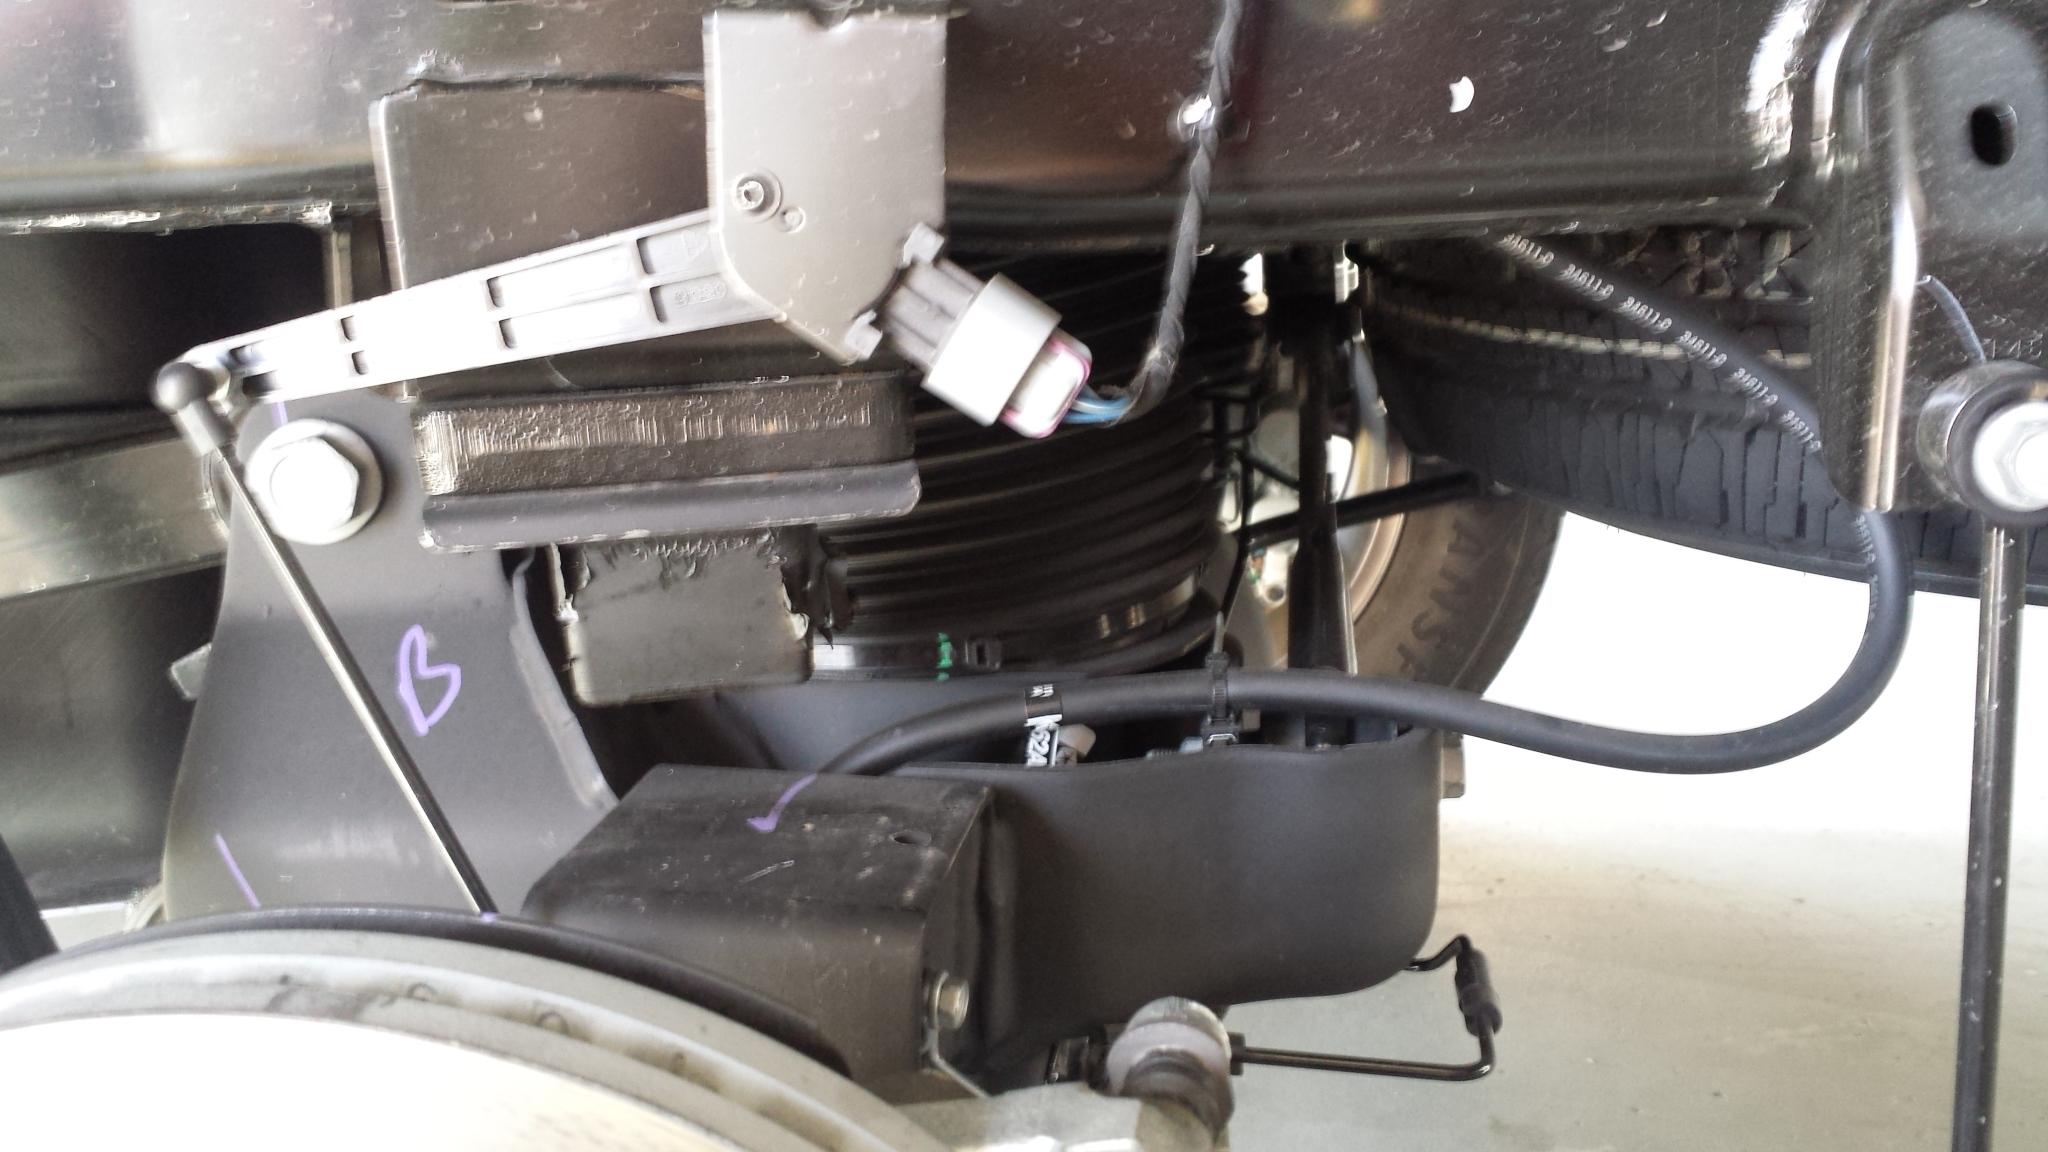 Air ride 3500 or 2500 rear auto level issues? - Dodge Cummins Diesel Forum